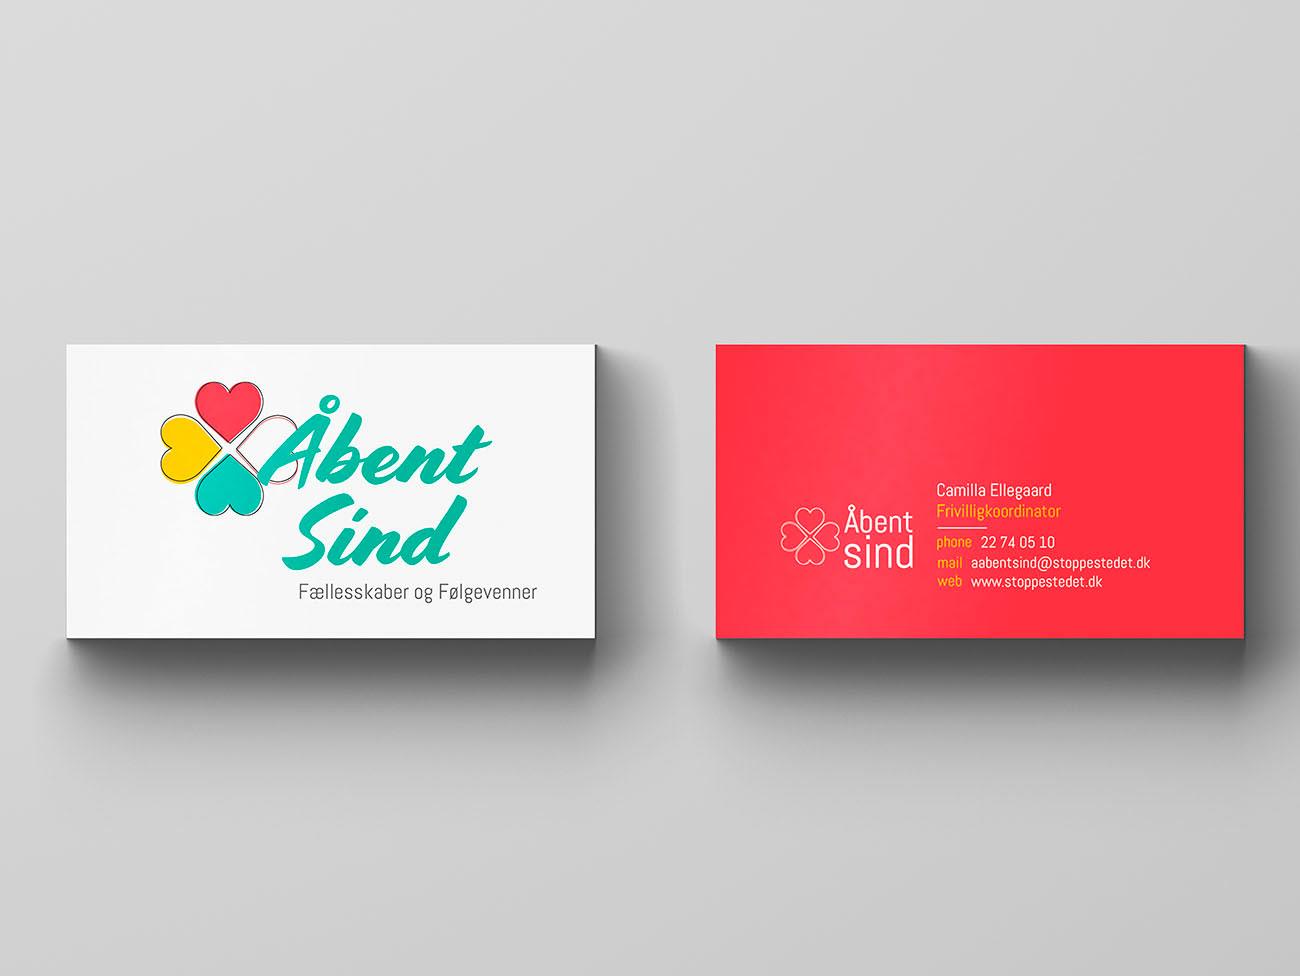 abent-sind-business-card